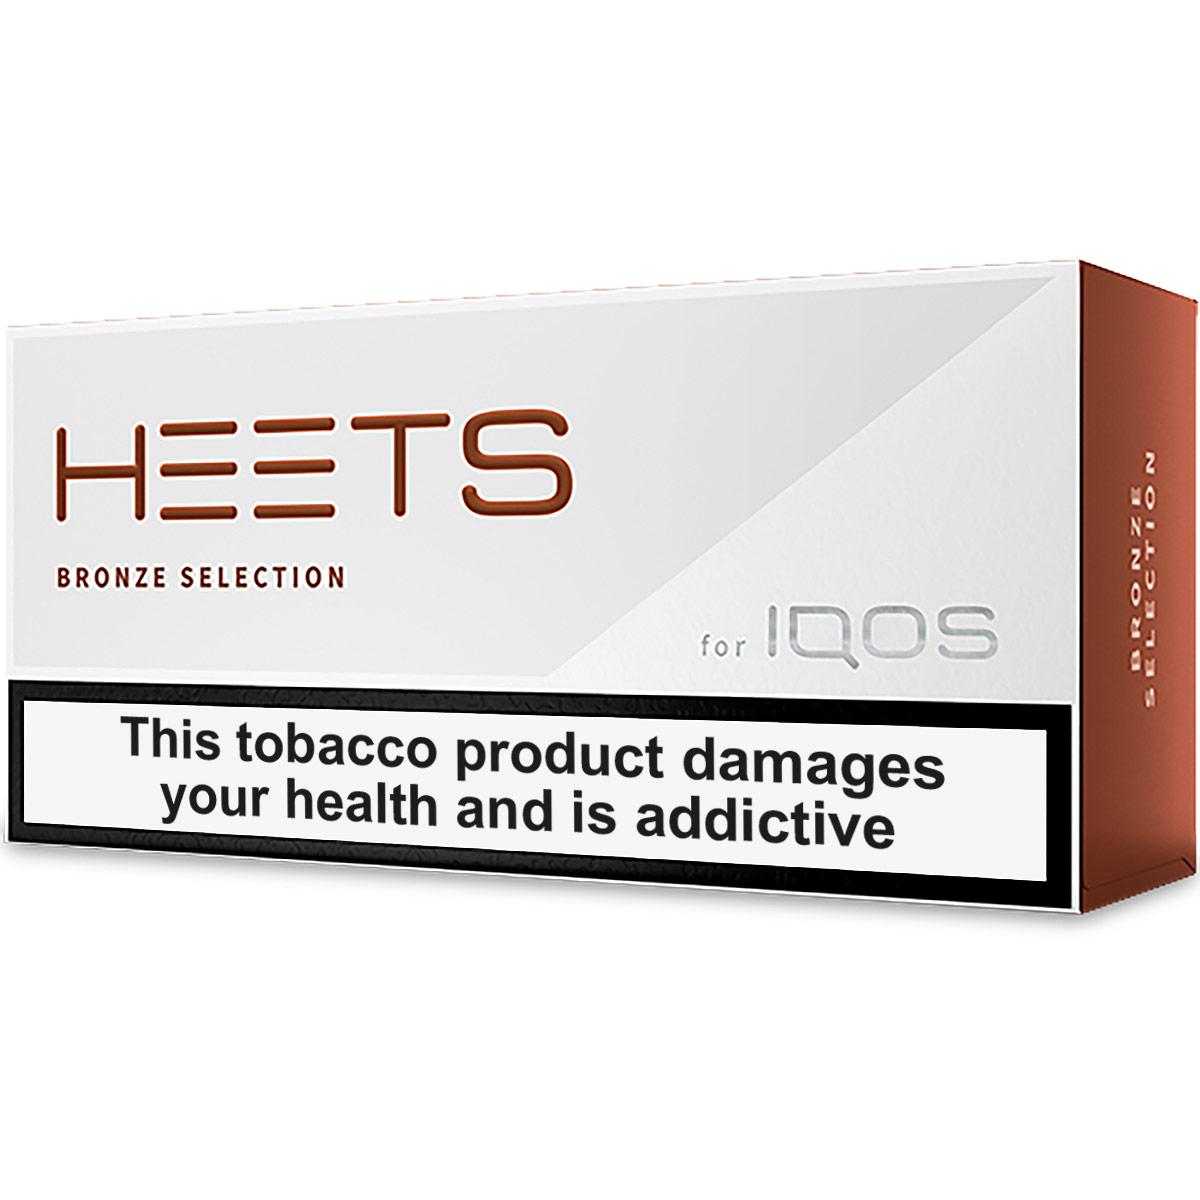 Heets - Bronze Selection